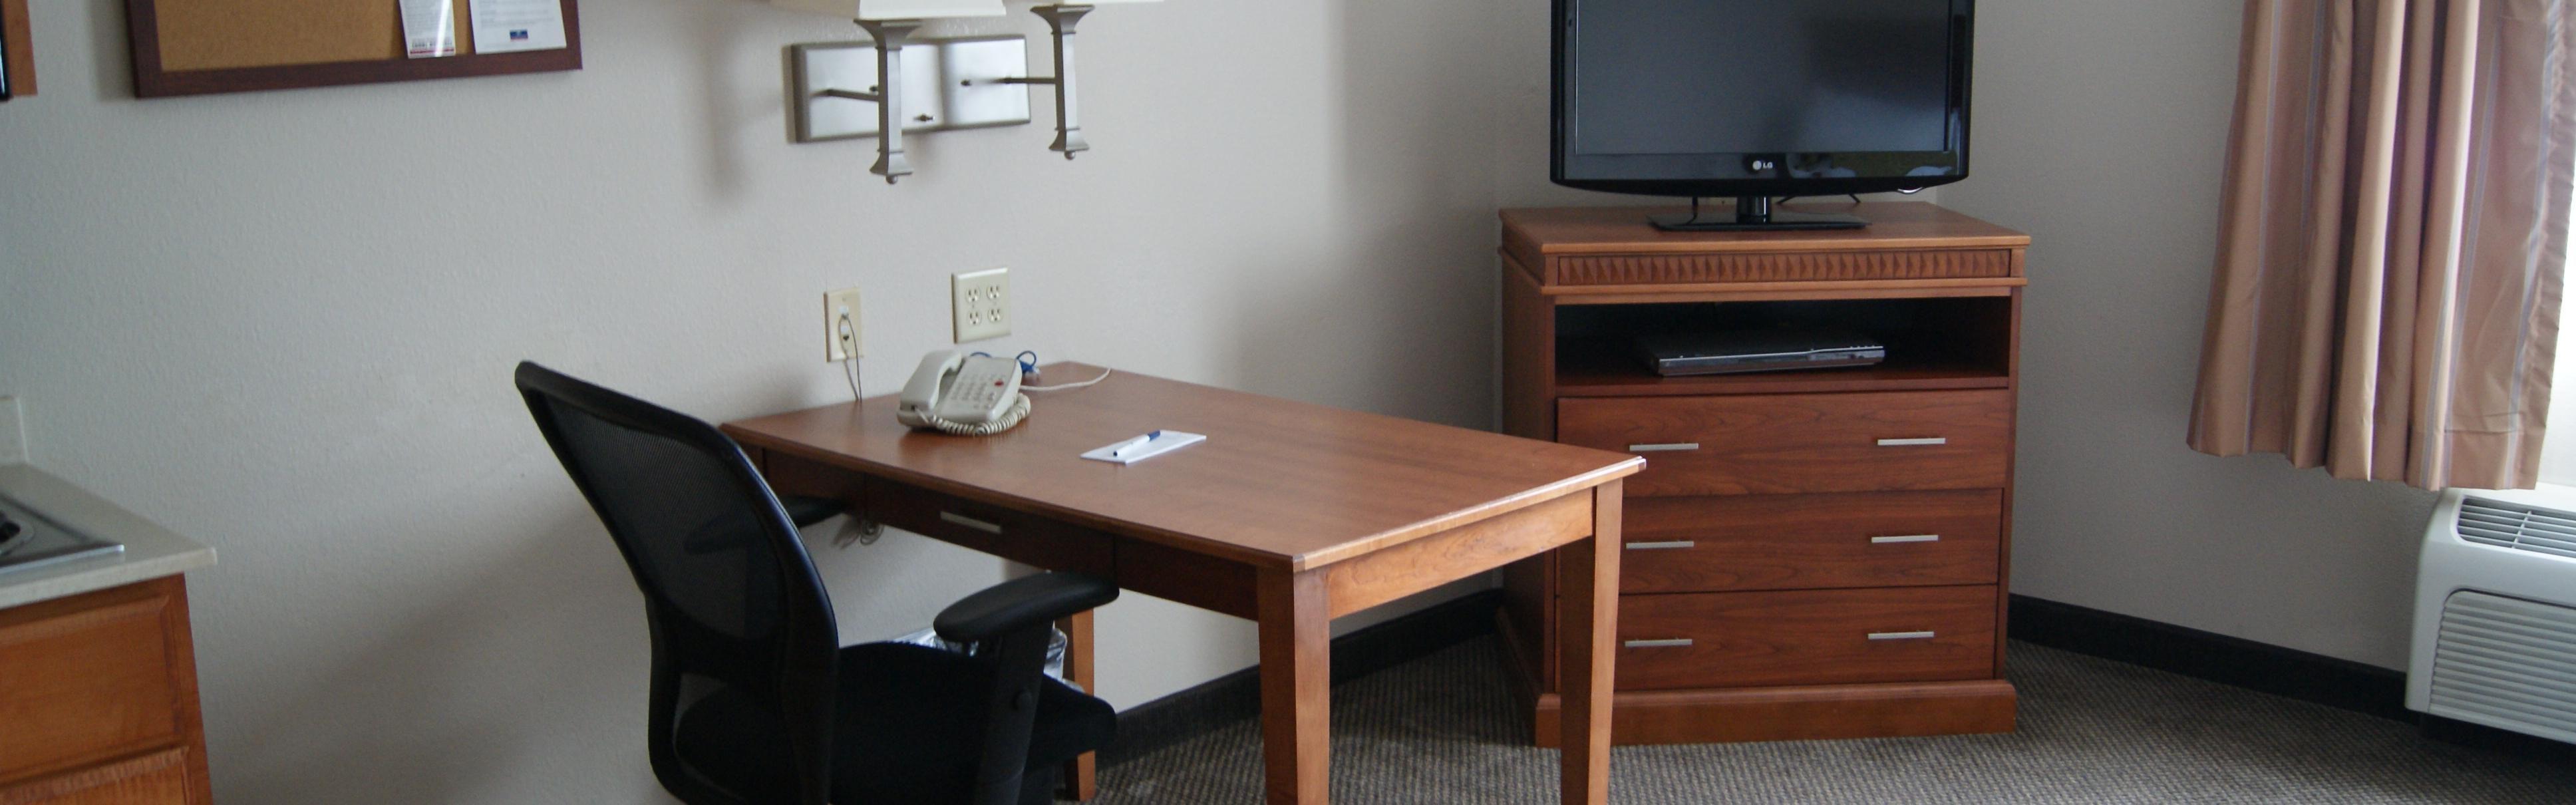 Candlewood Suites Polaris image 1